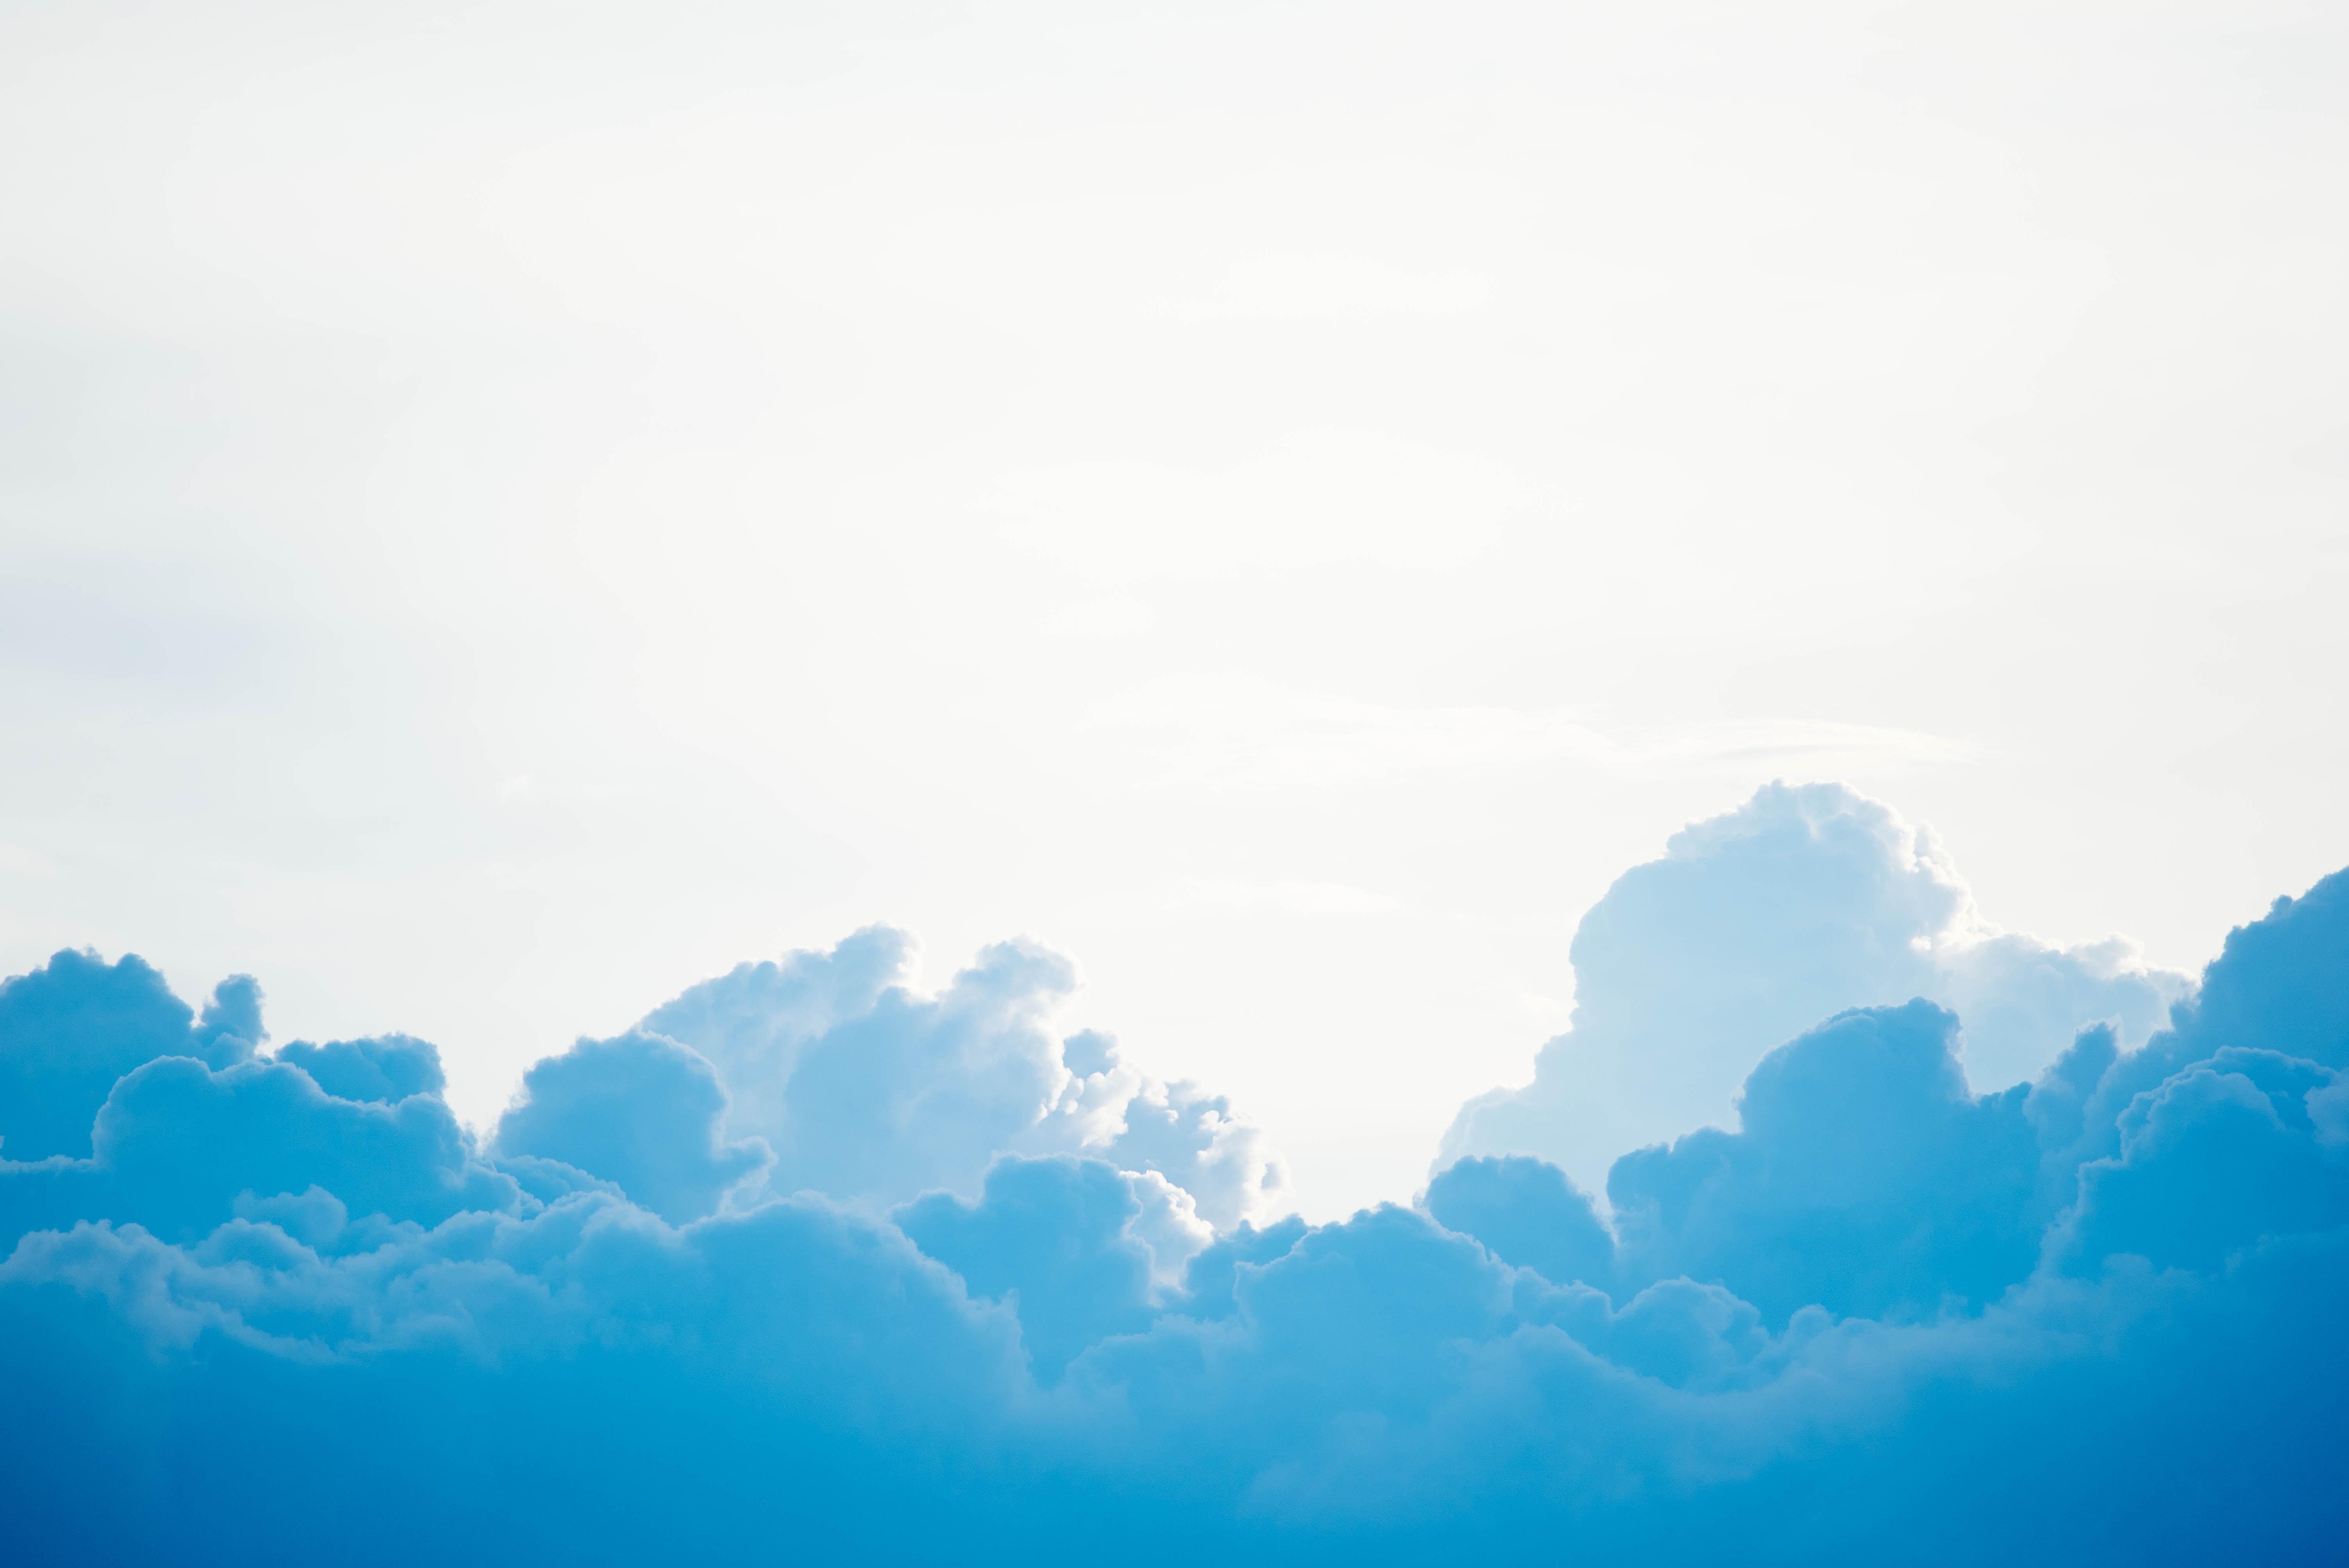 blue clouds under white sky